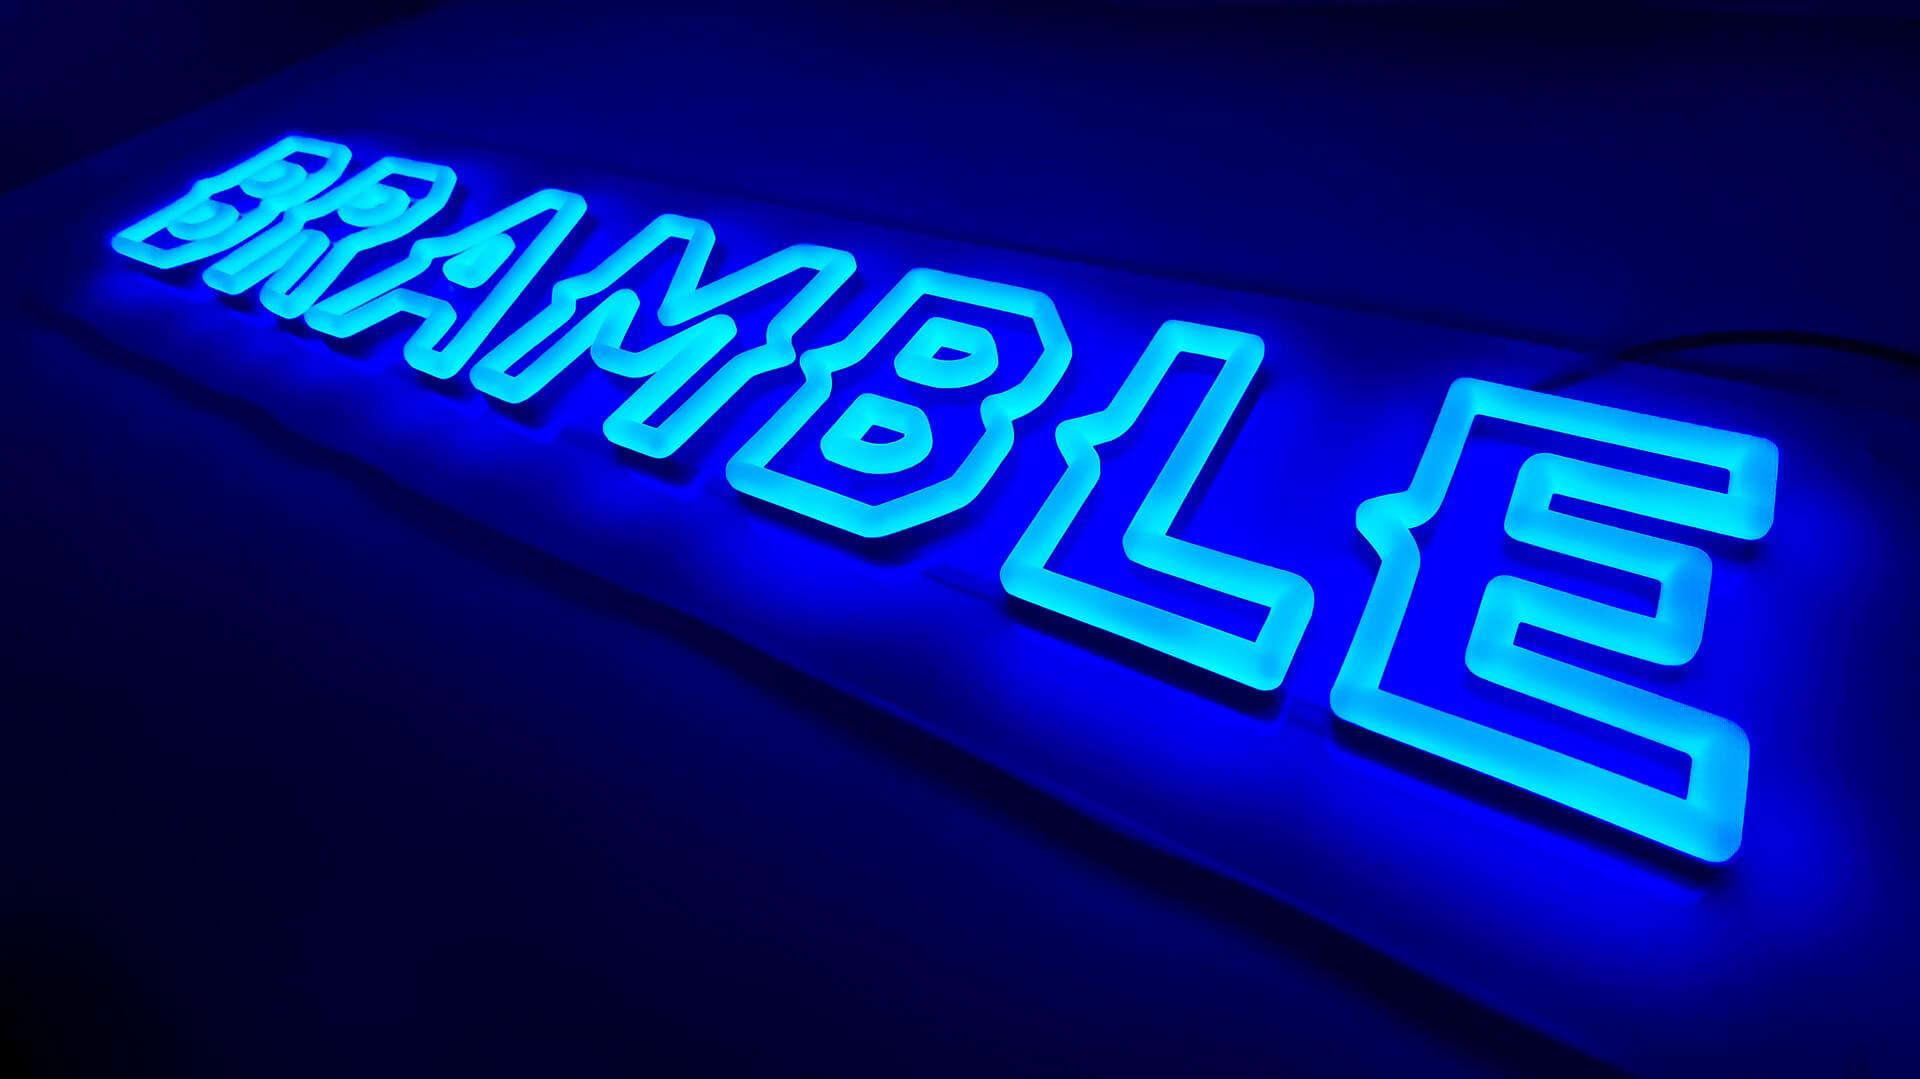 Creative shot of the Brumble neon wall decor